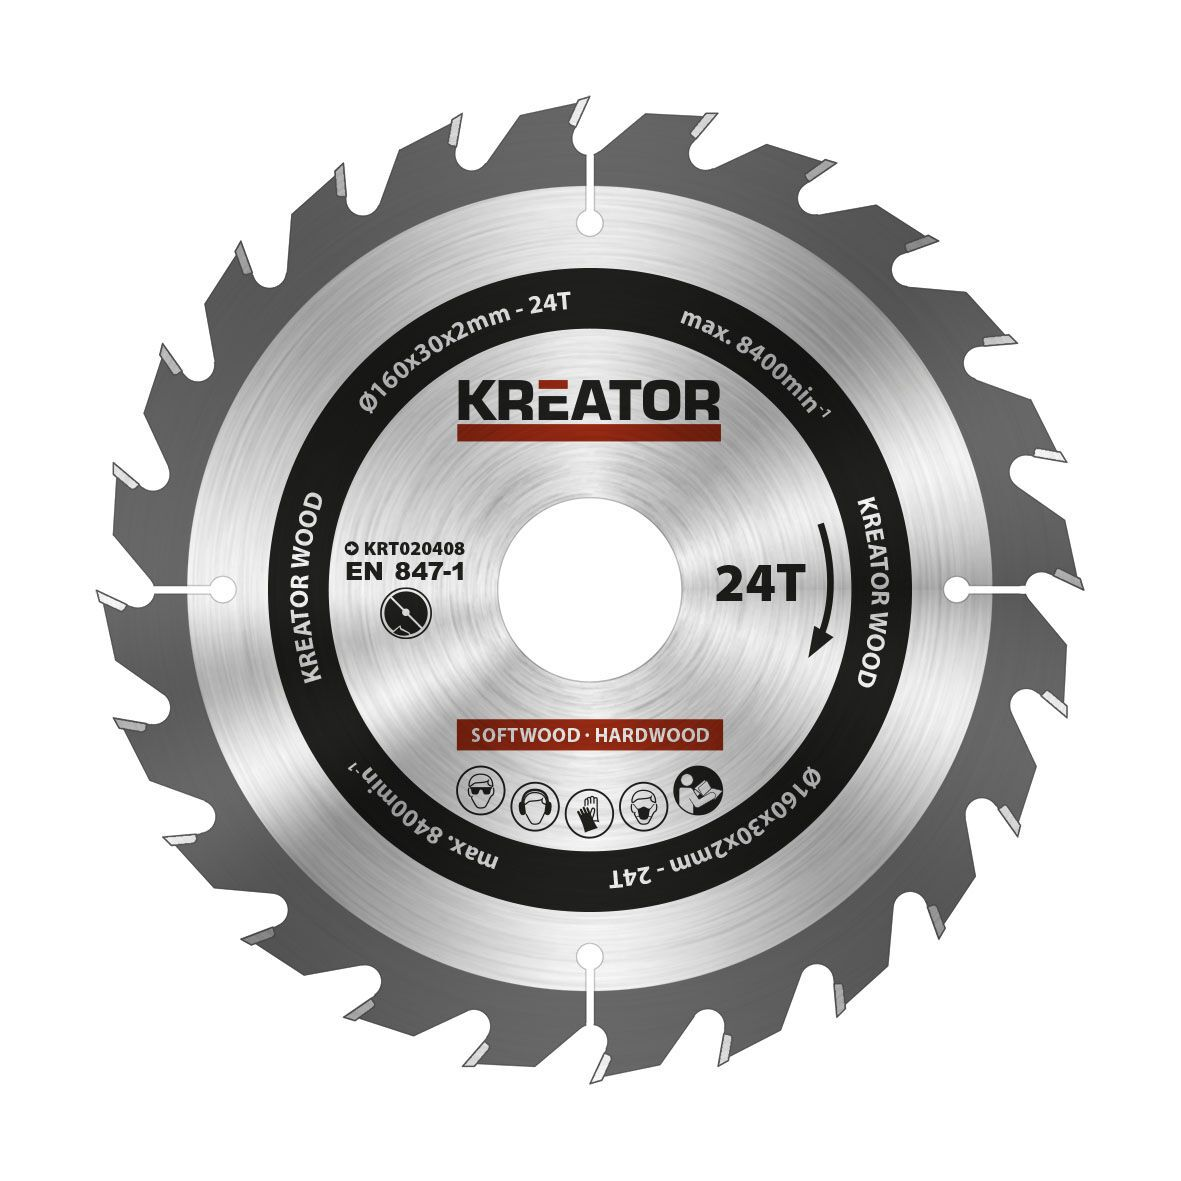 Kreator KRT020408 Cirkelzaagblad 160mm 24T   Zaagblad cirkelzaag hout